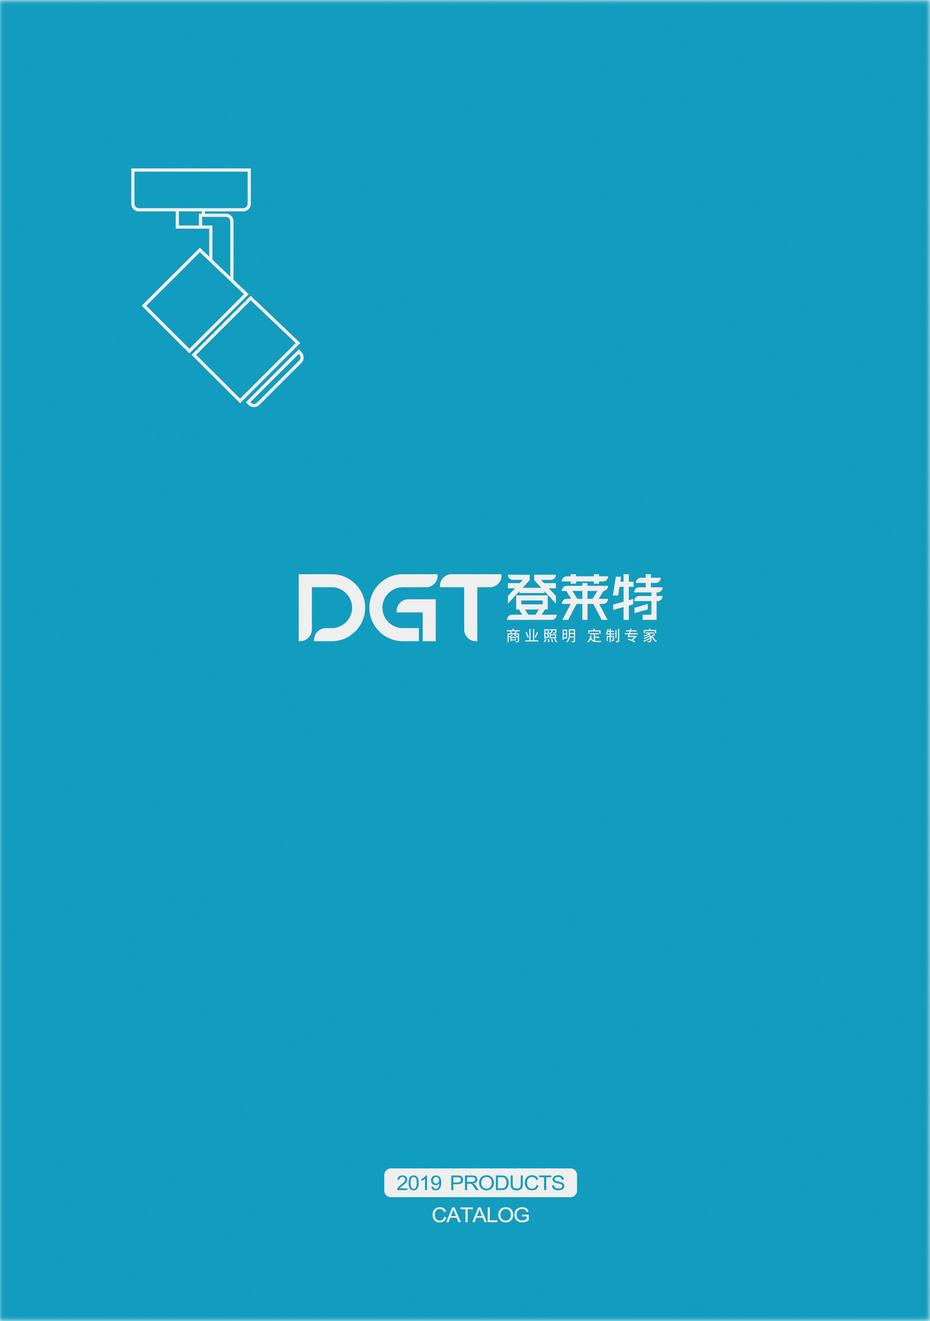 DGT Lighting Catalog 2019